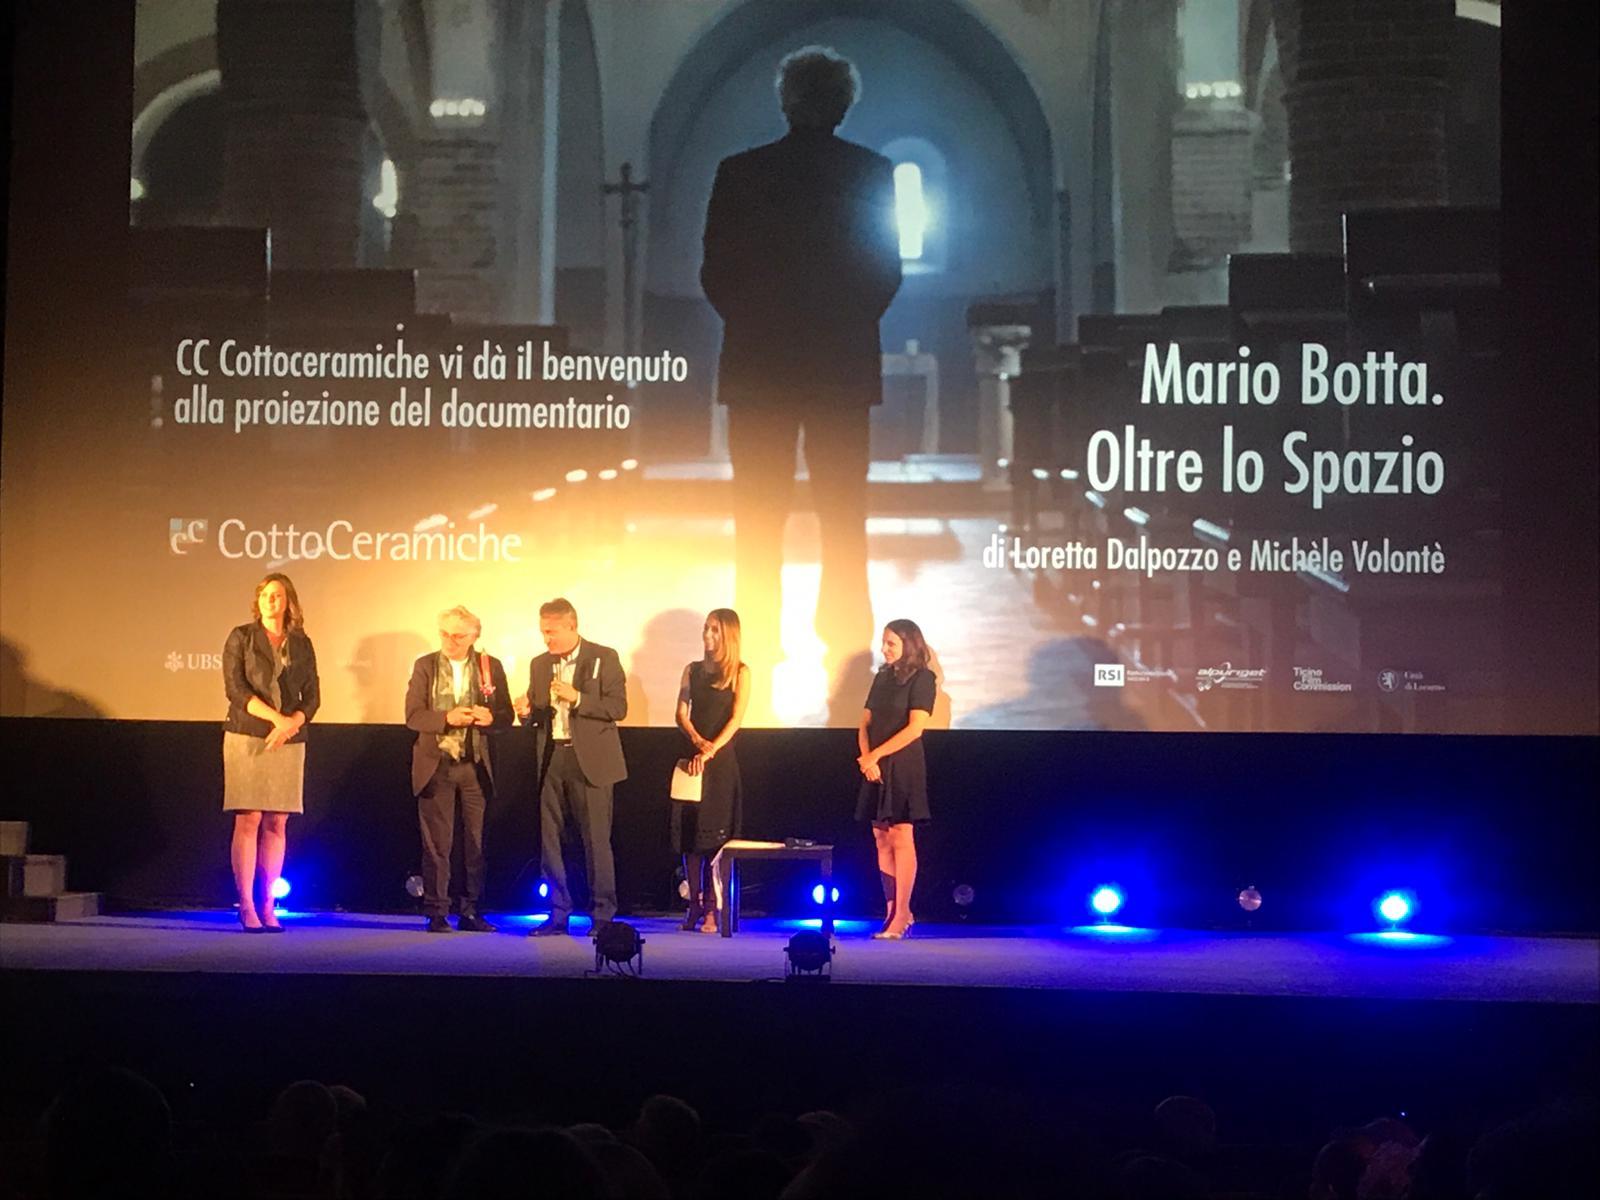 Mario Botta - The Space Beyond